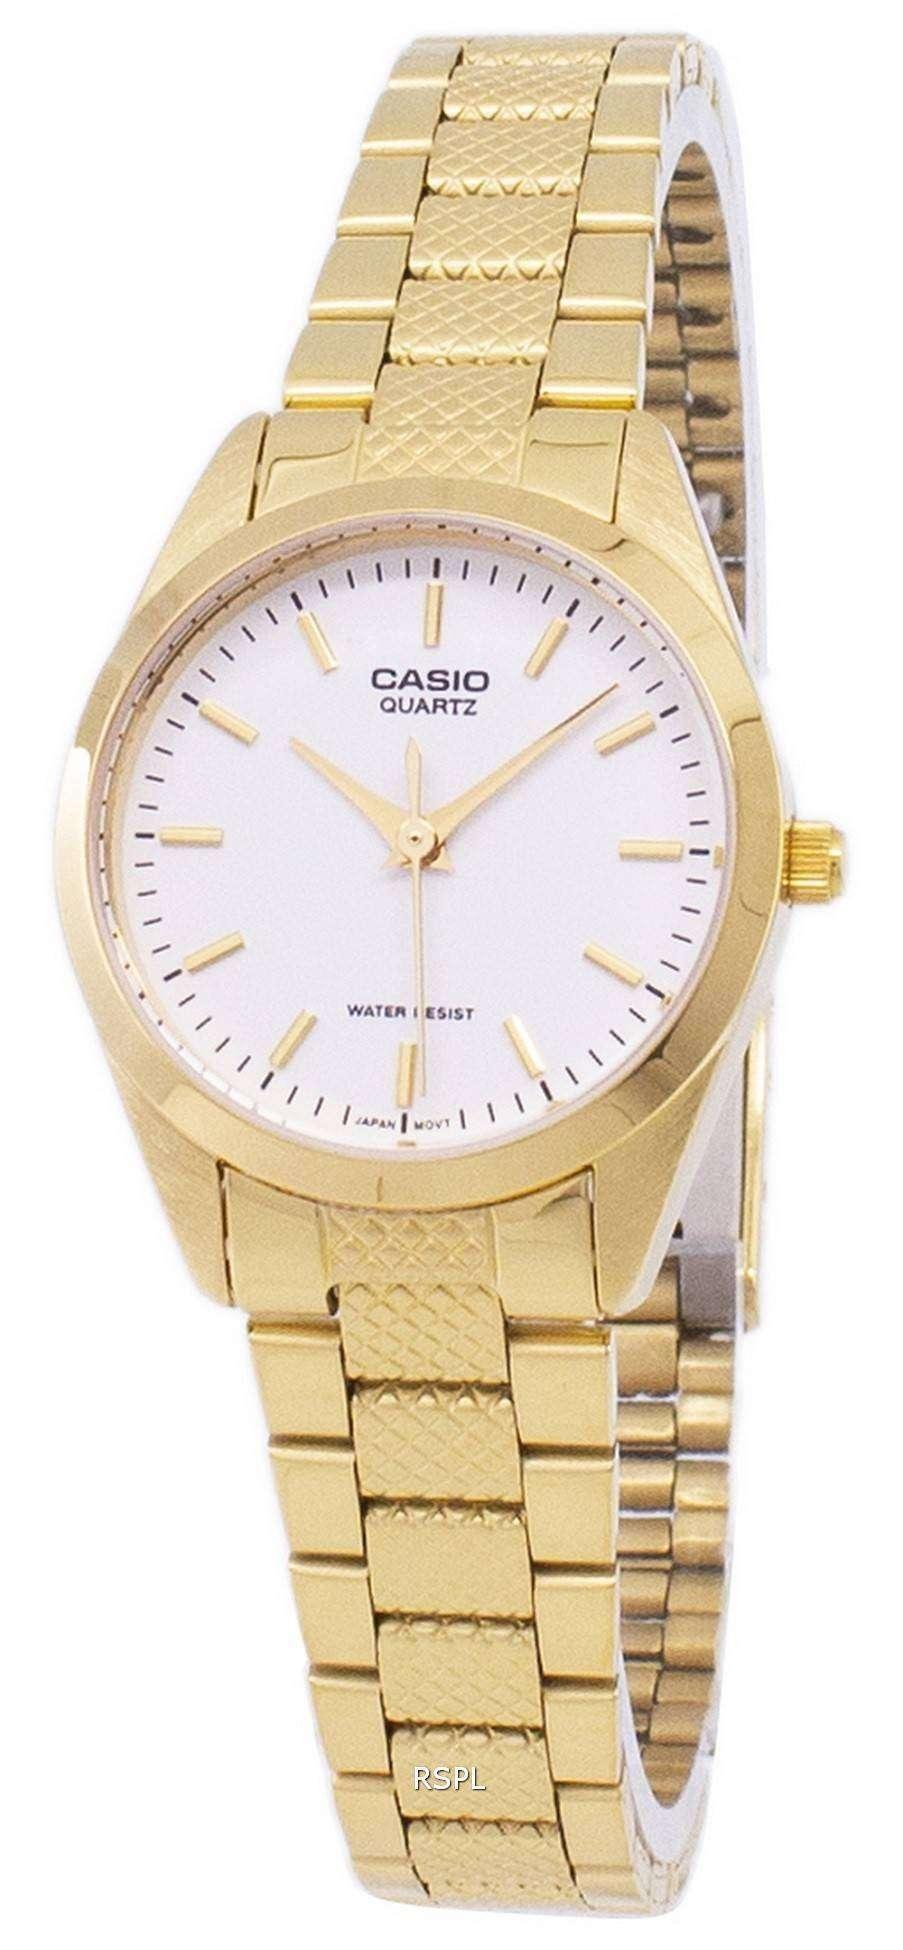 6dd7fb0e6c71 Reloj Casio analógico cuarzo dorado esfera blanca LTP-1274G-7ADF LTP-1274G-